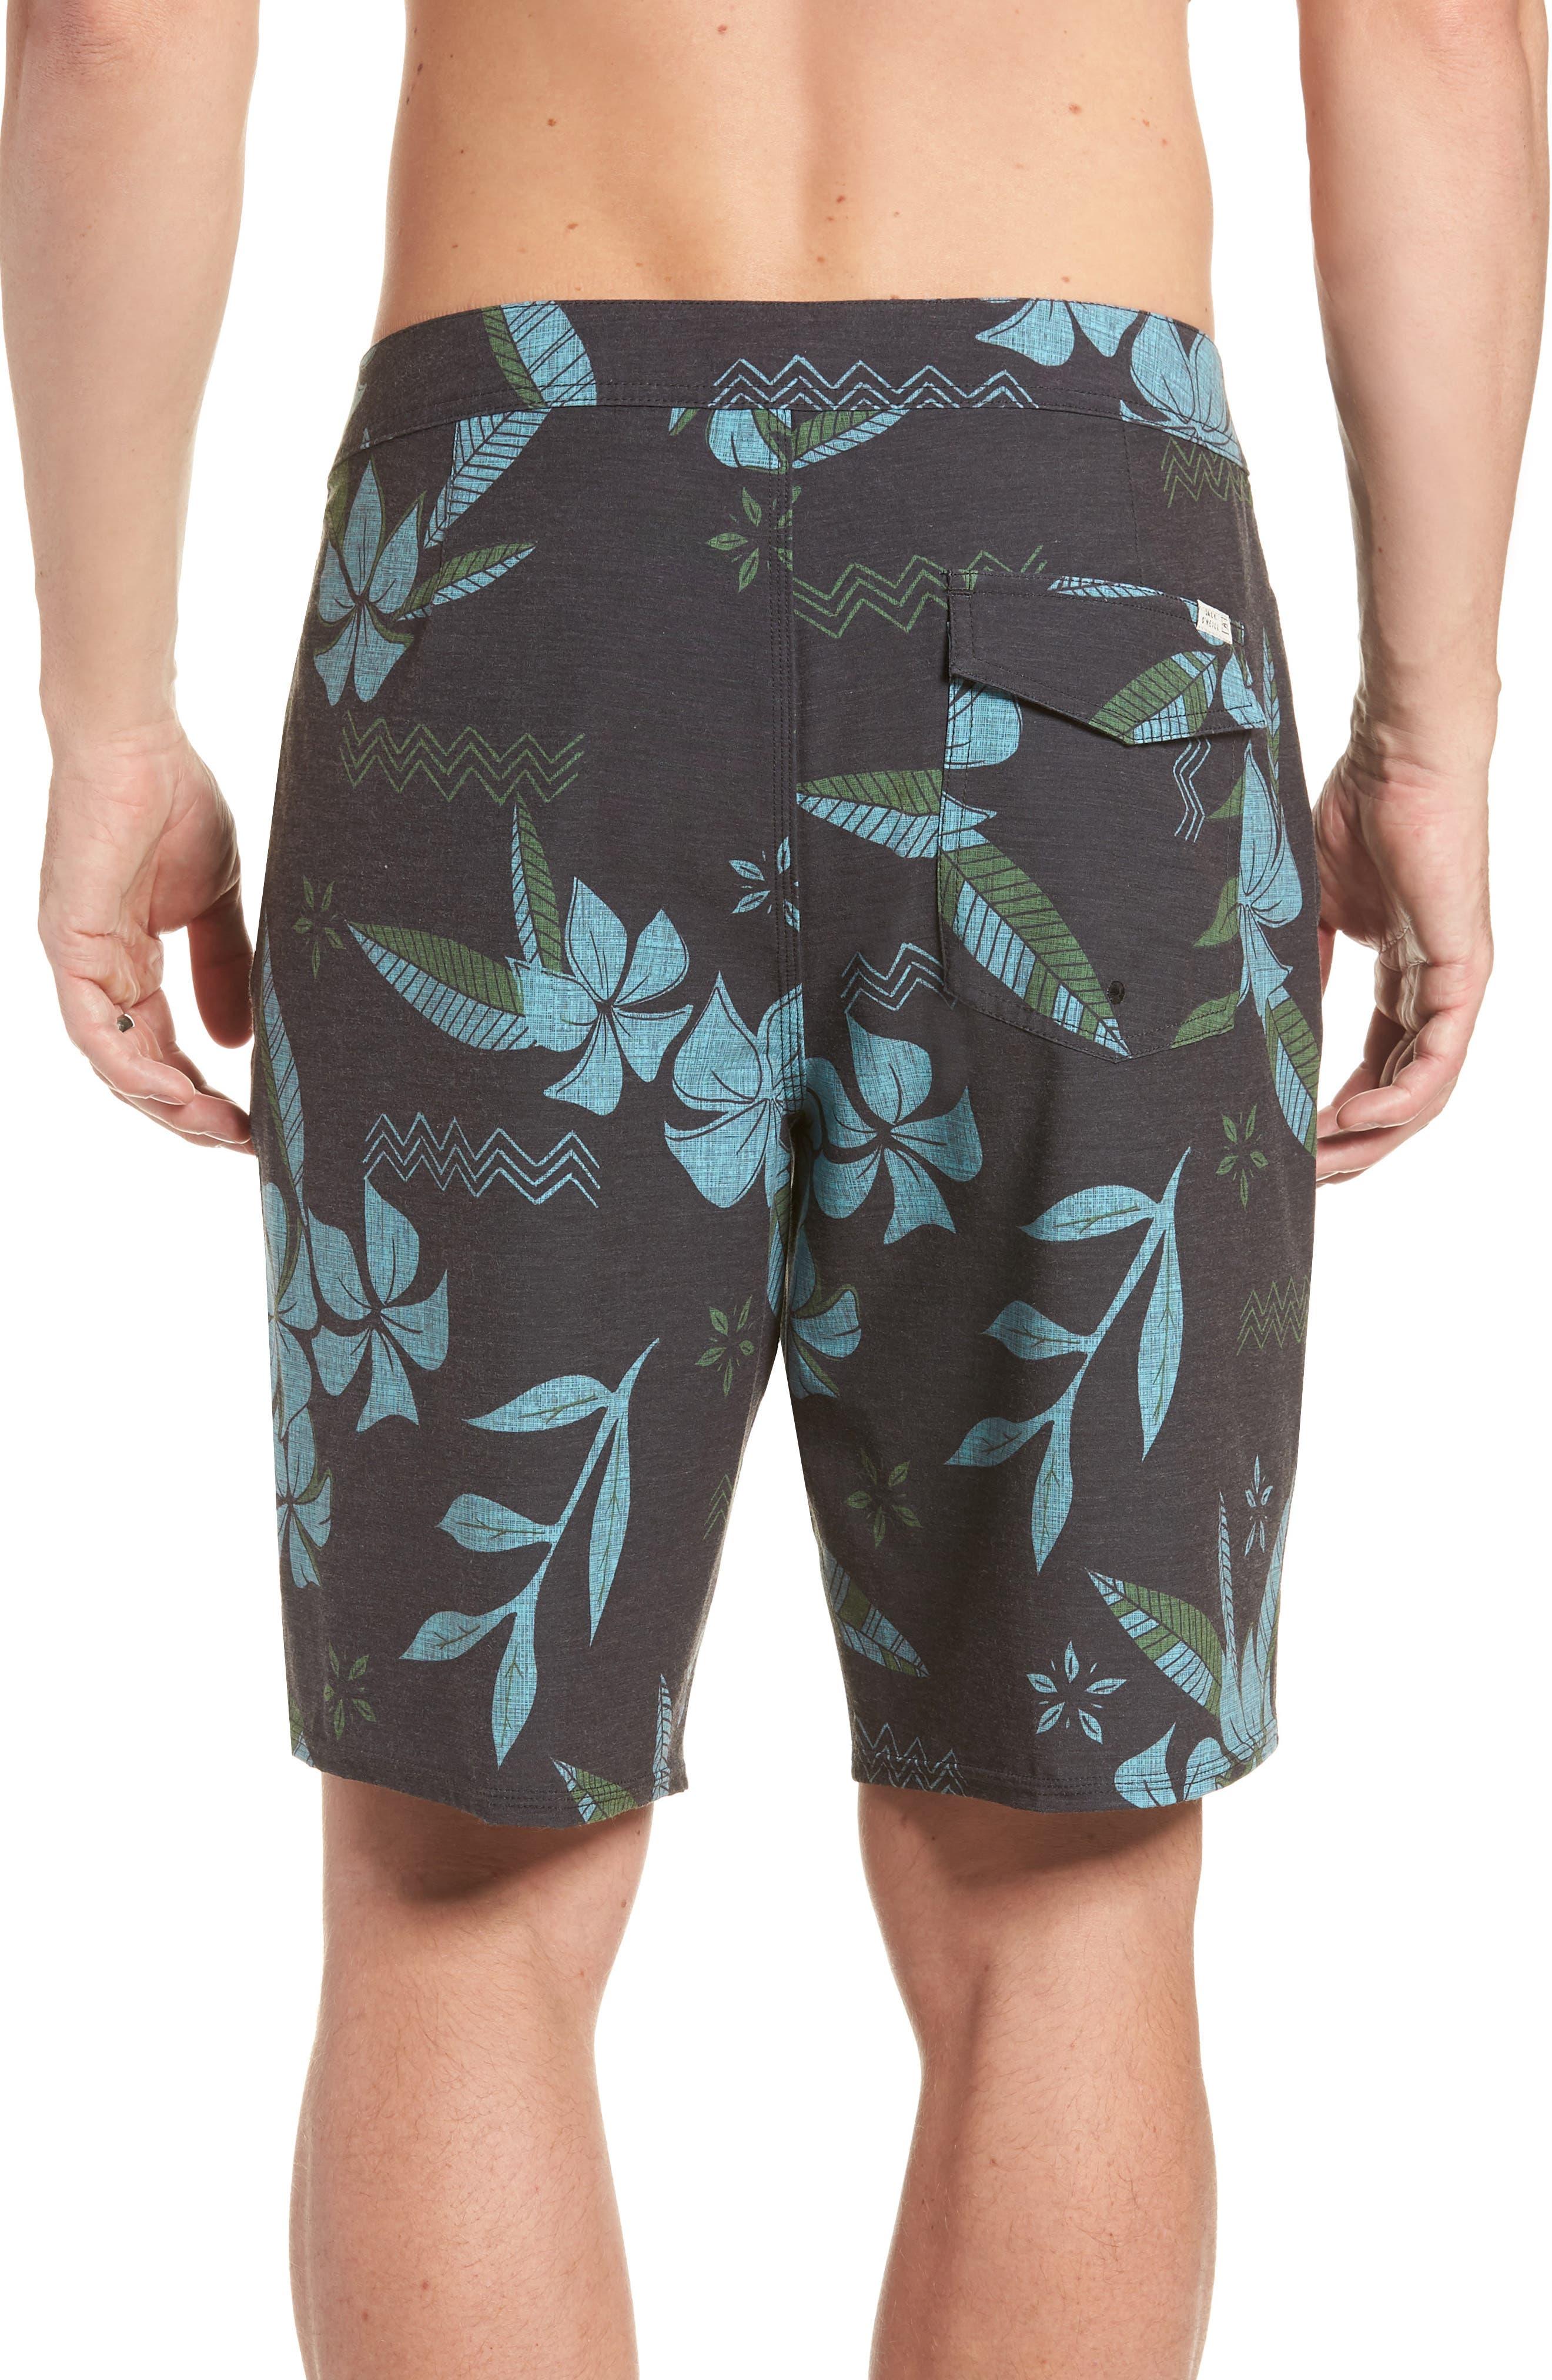 Maui Board Shorts,                             Alternate thumbnail 2, color,                             Black